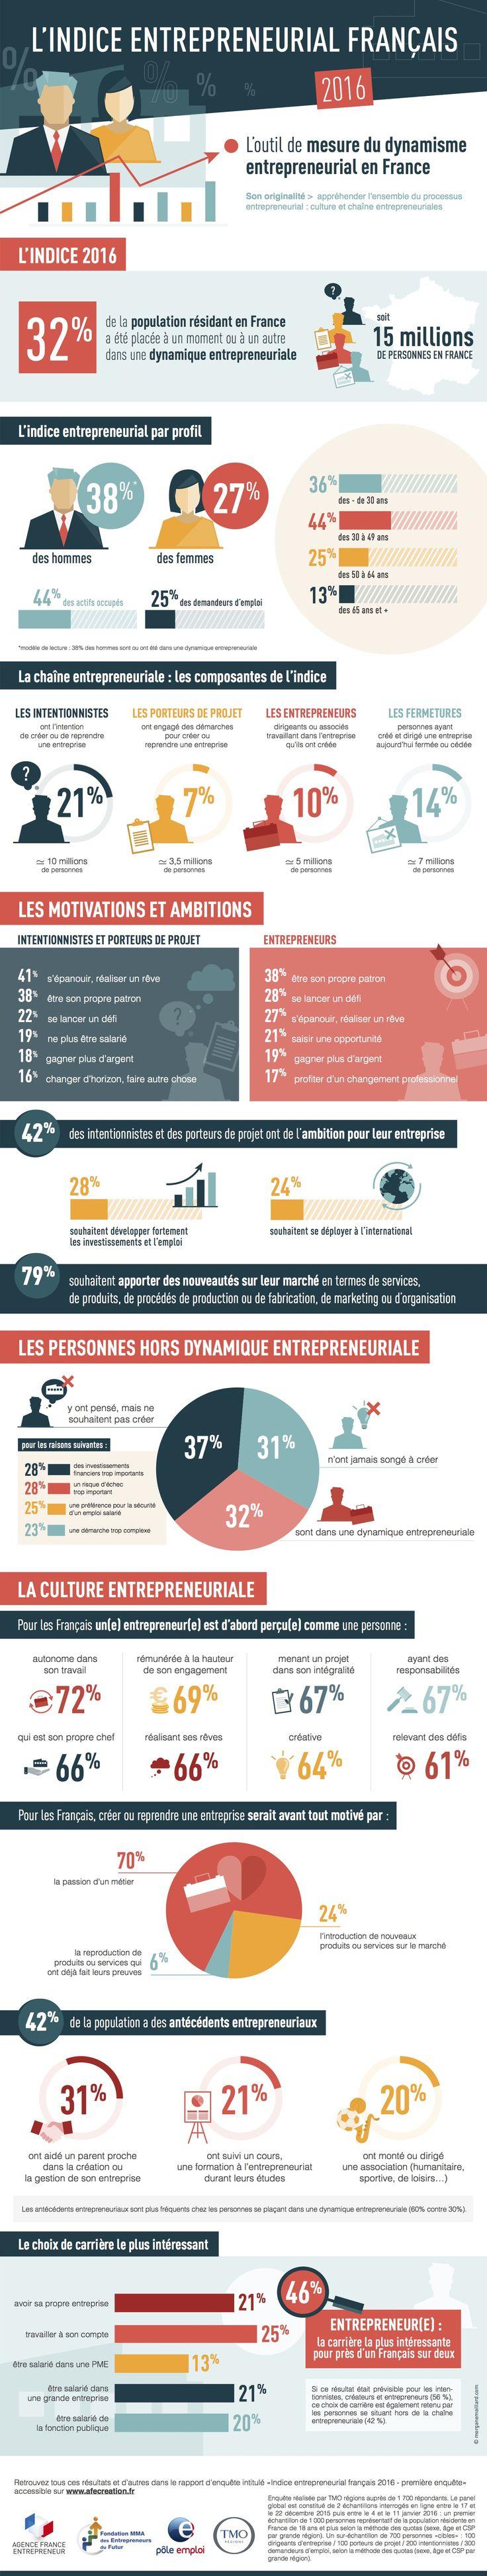 L'indice entreprenarial français